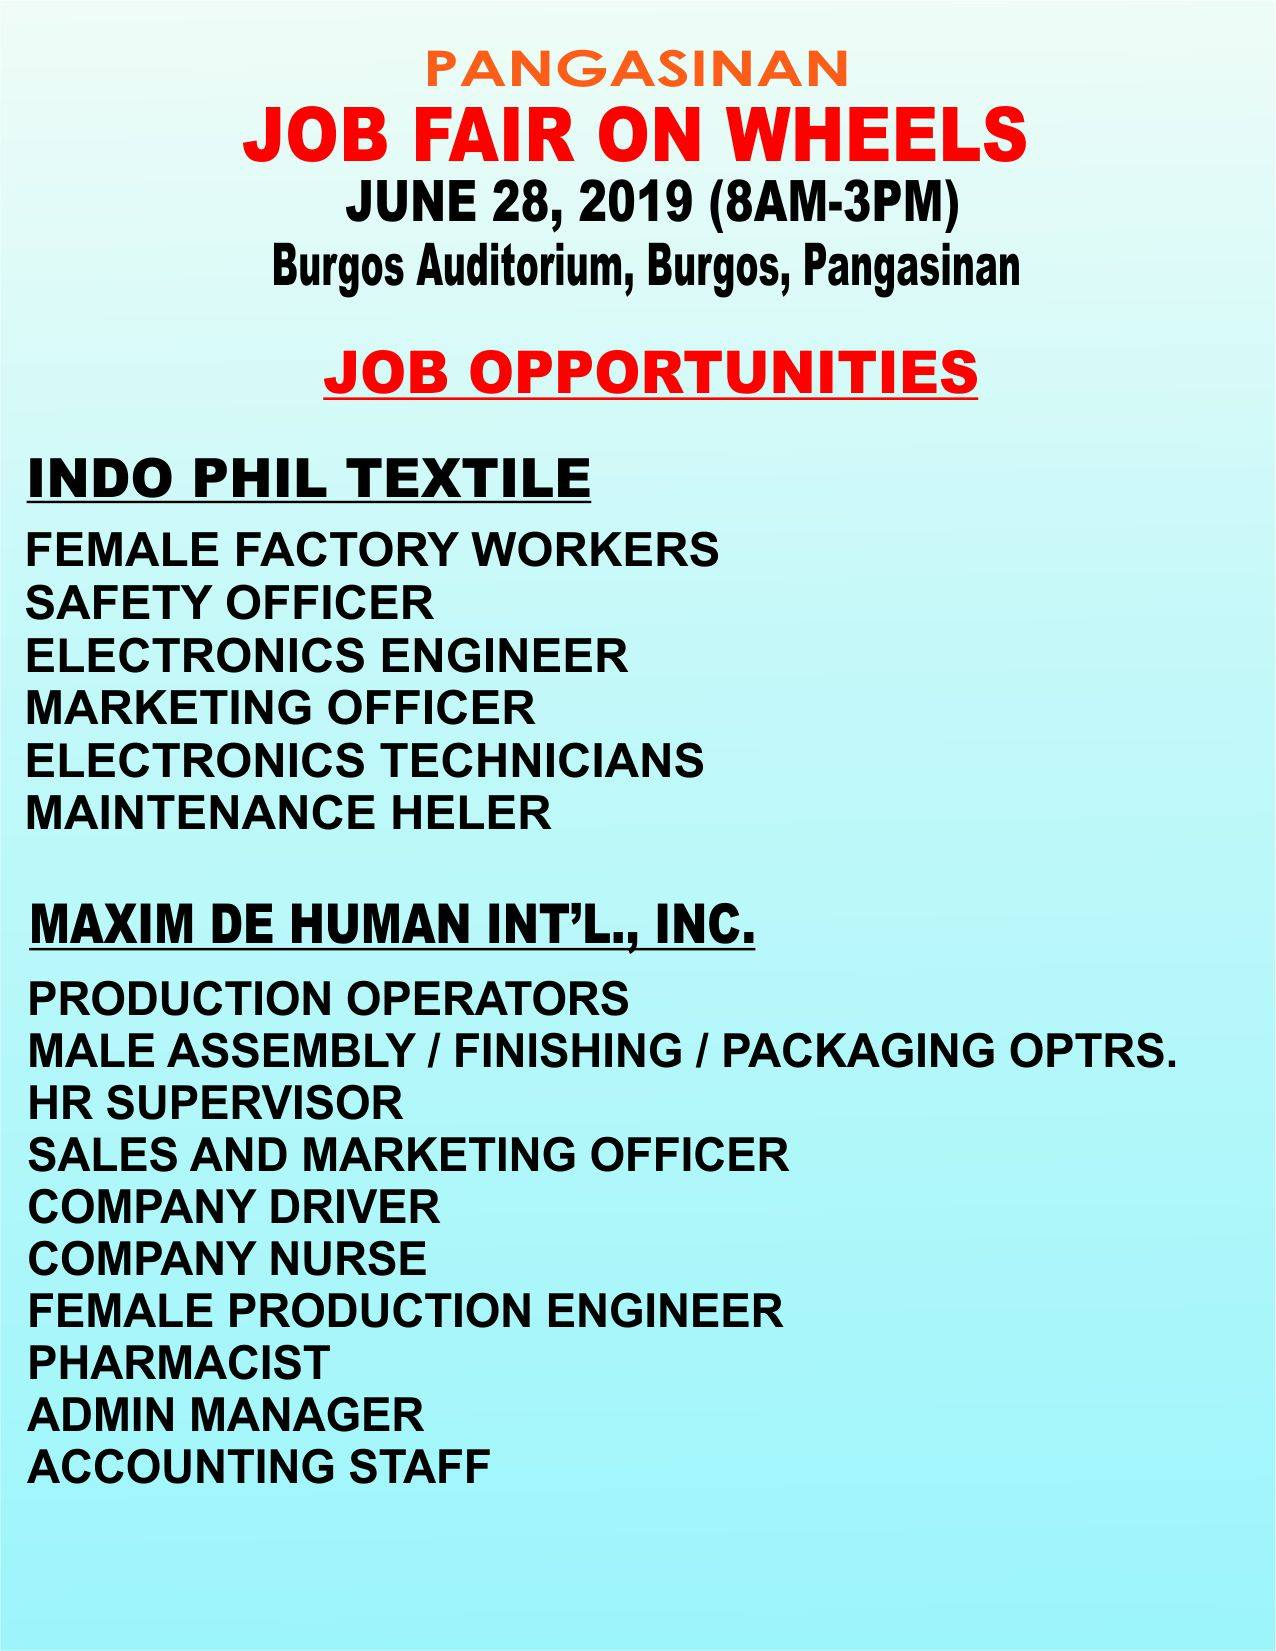 JOBS FAIR IN BURGOS (7)